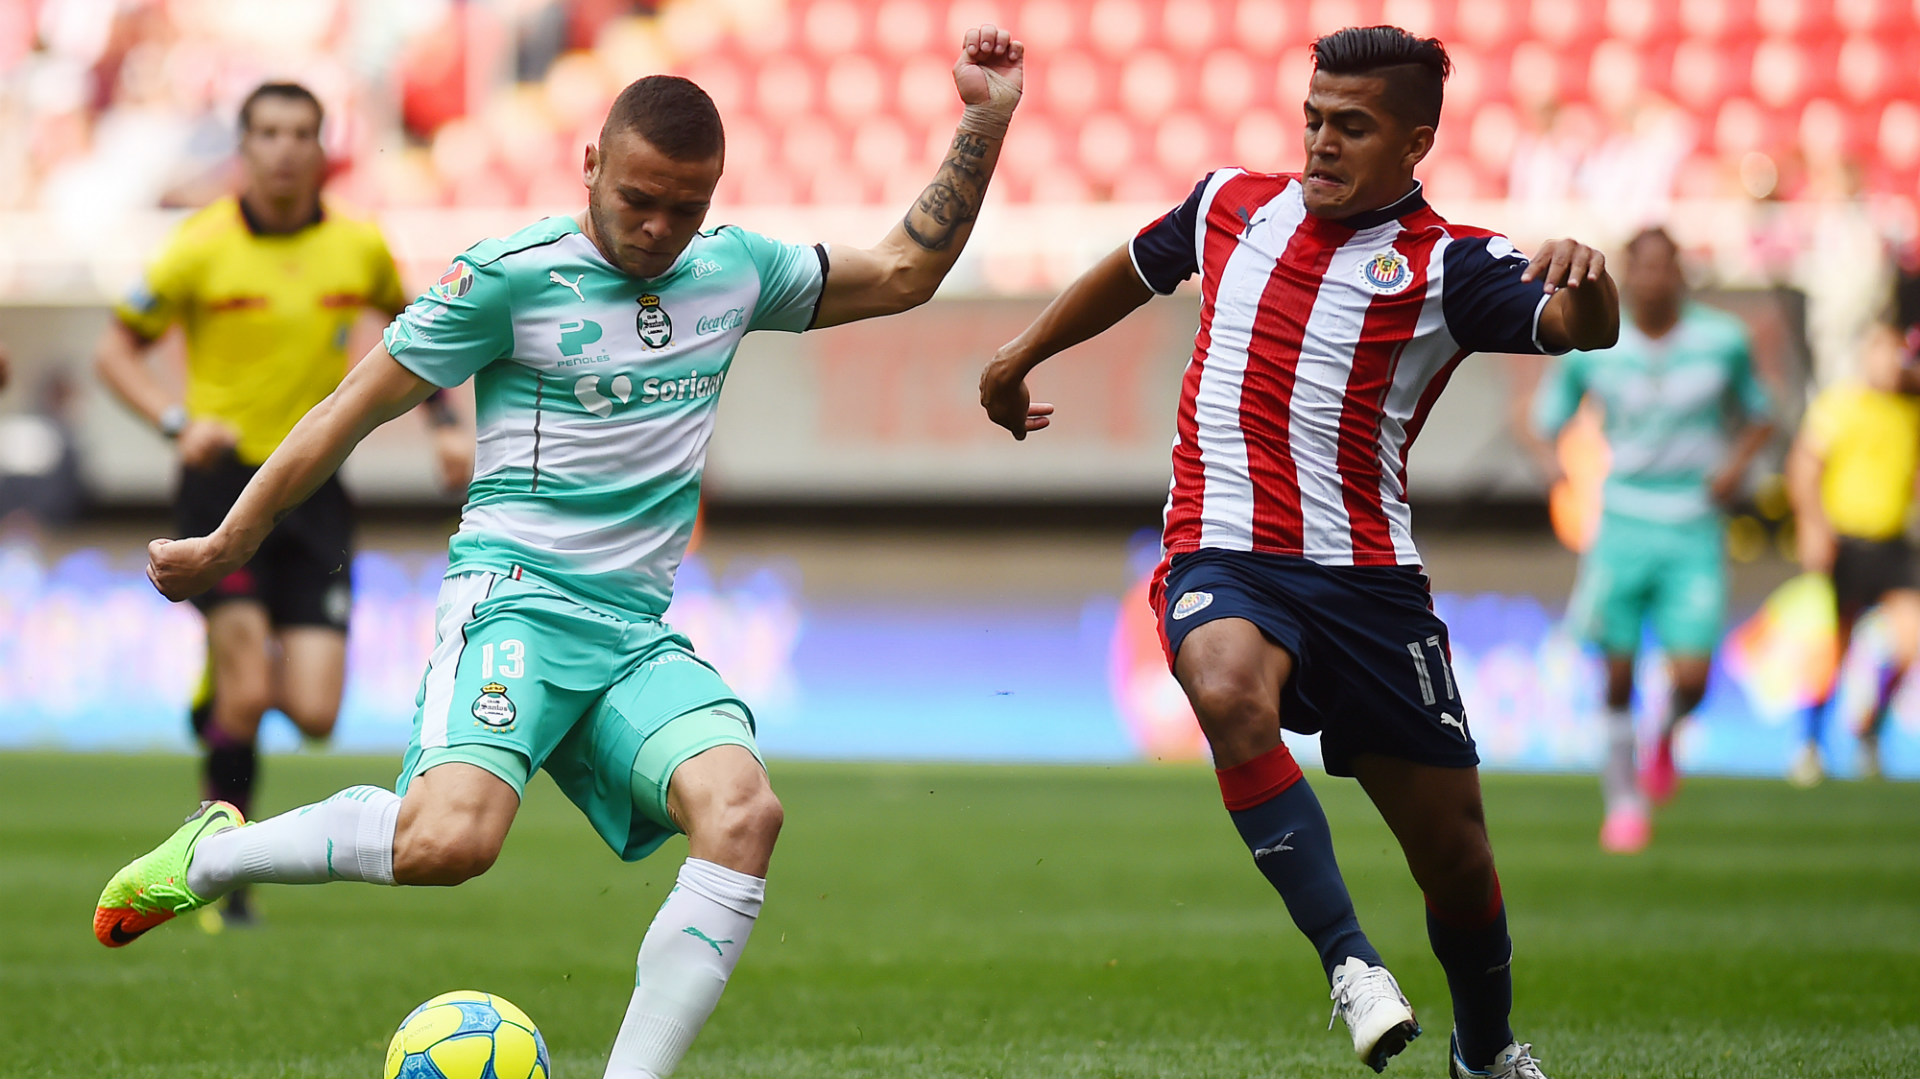 Jonathan Rodriguez Santos Laguna Jesus Sanchez Chivas